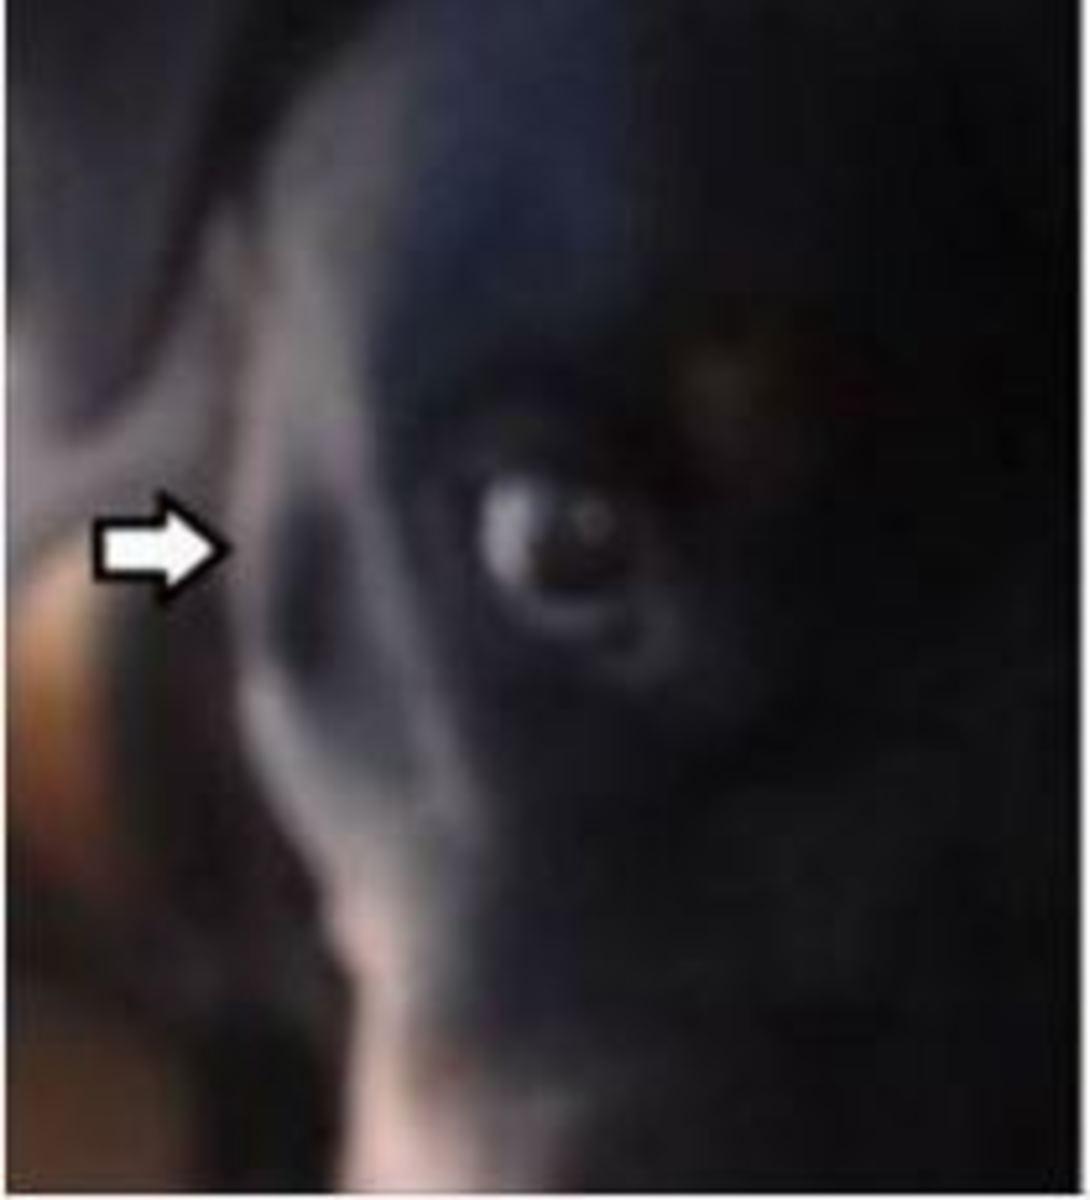 lymph-node-face-dog